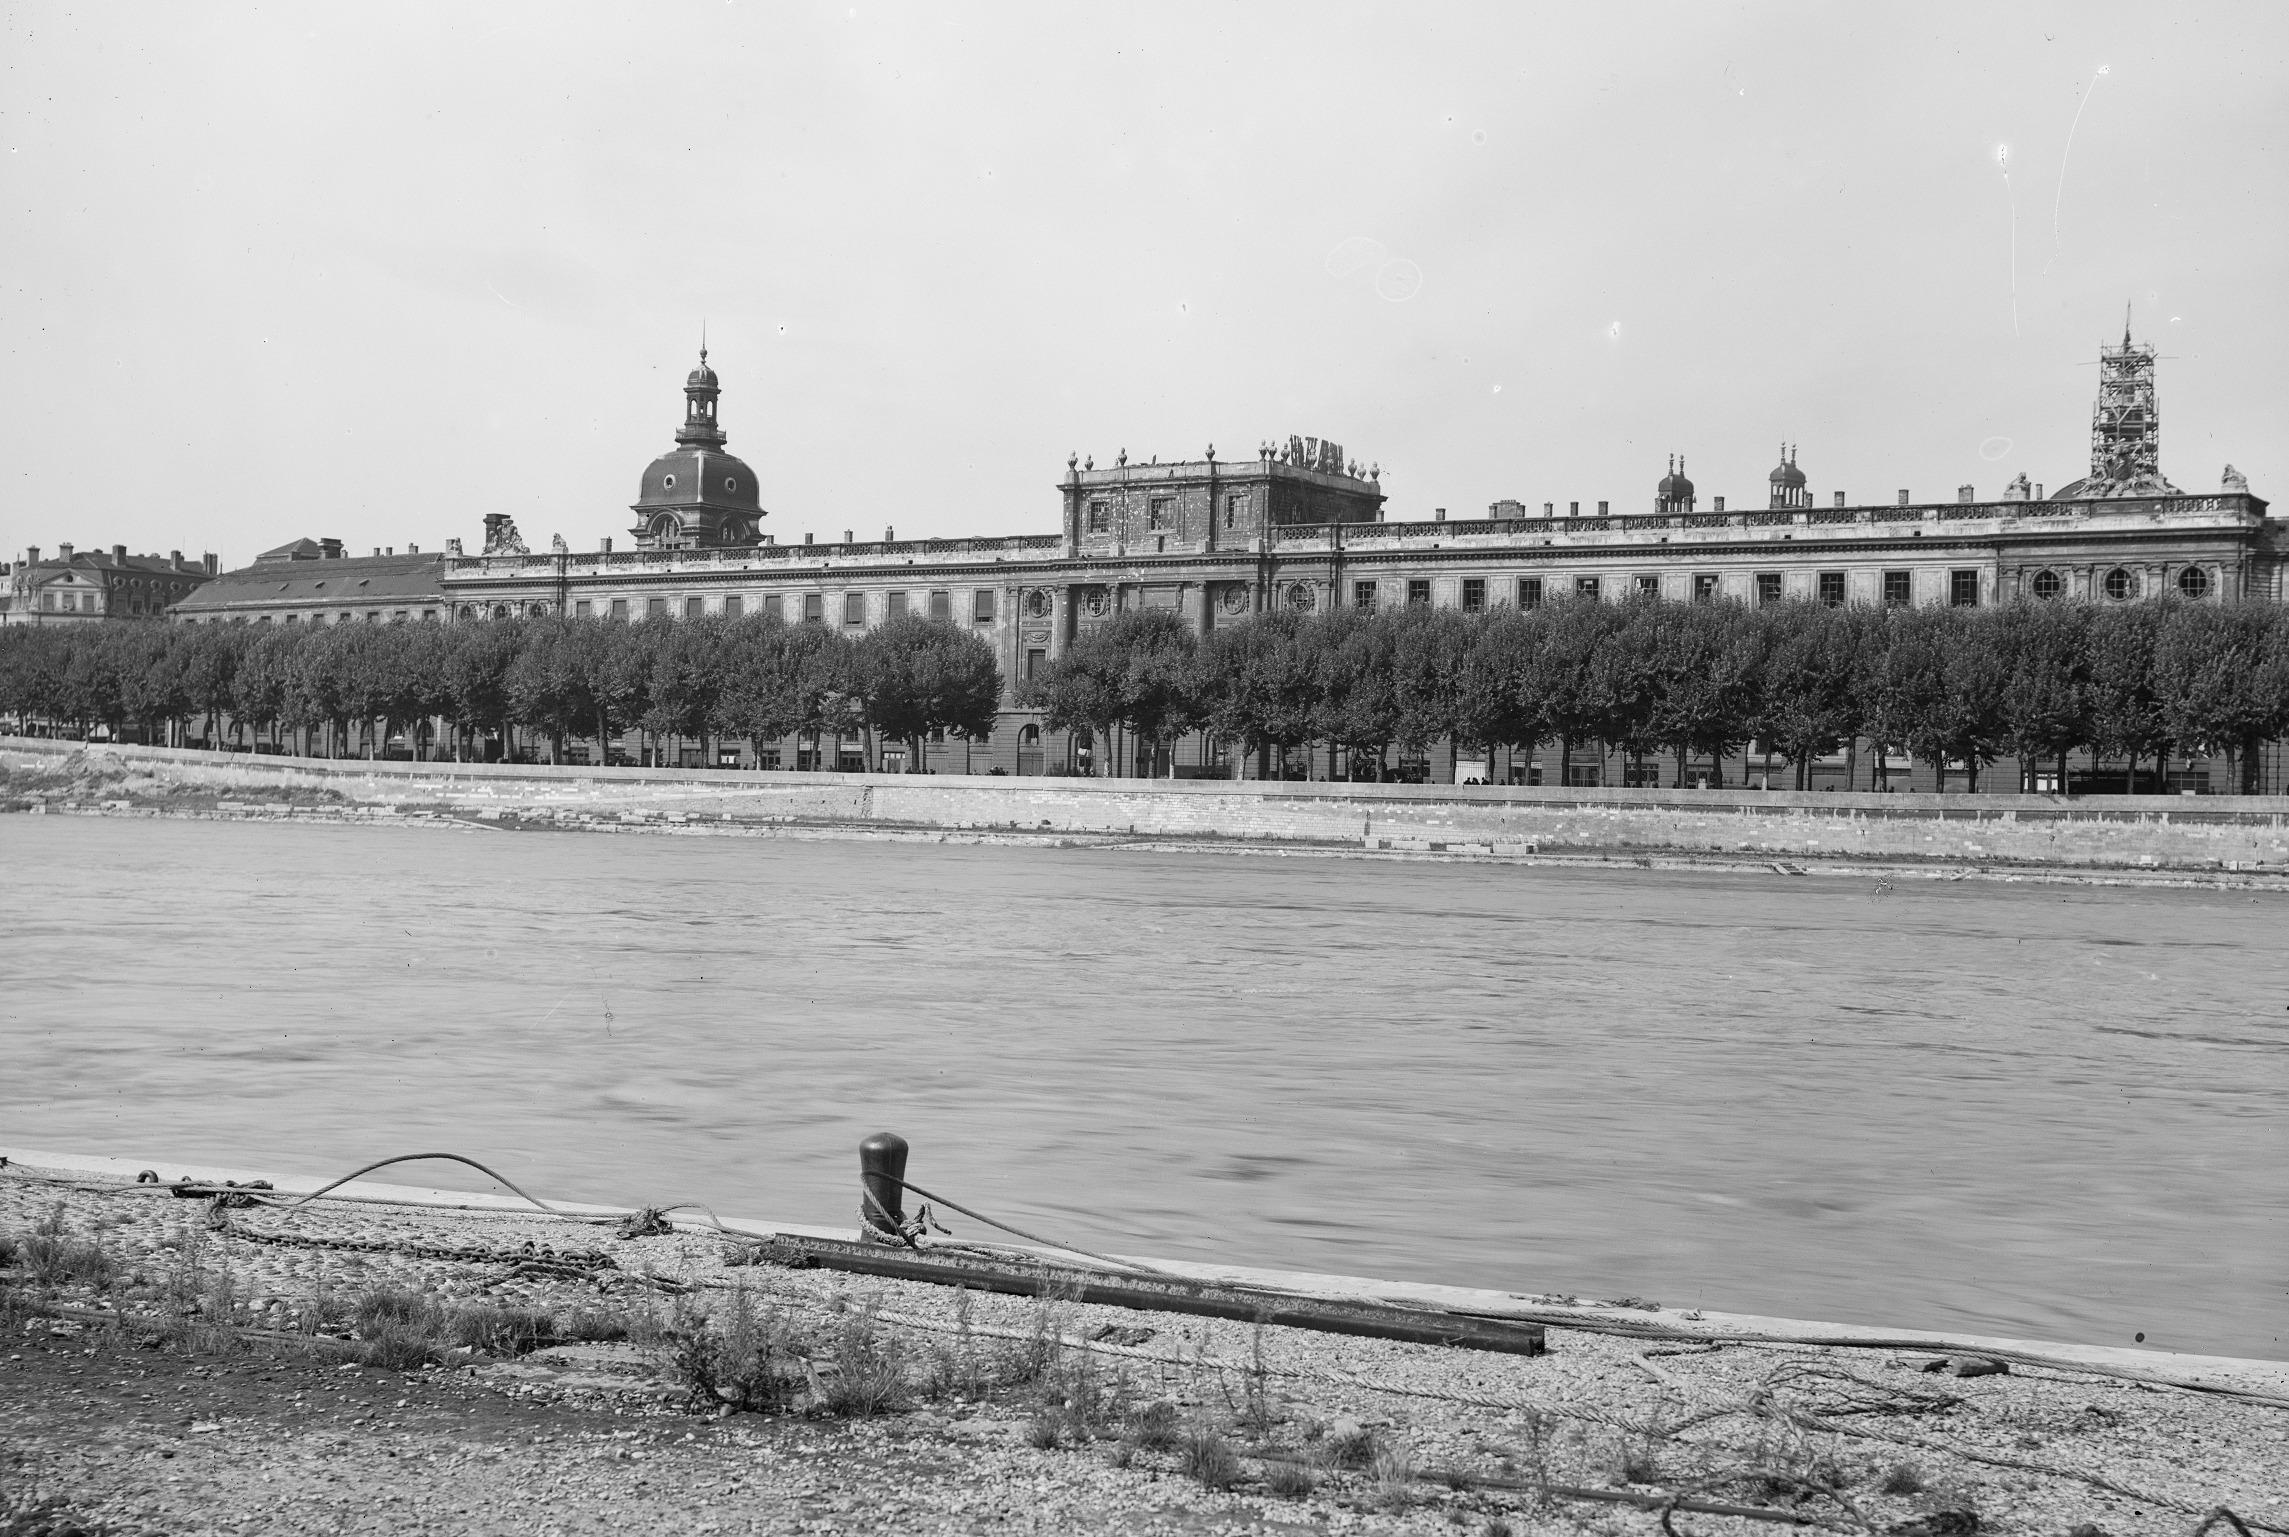 InterContinental-Lyon-Hotel-Dieu-Image-Historique (2)